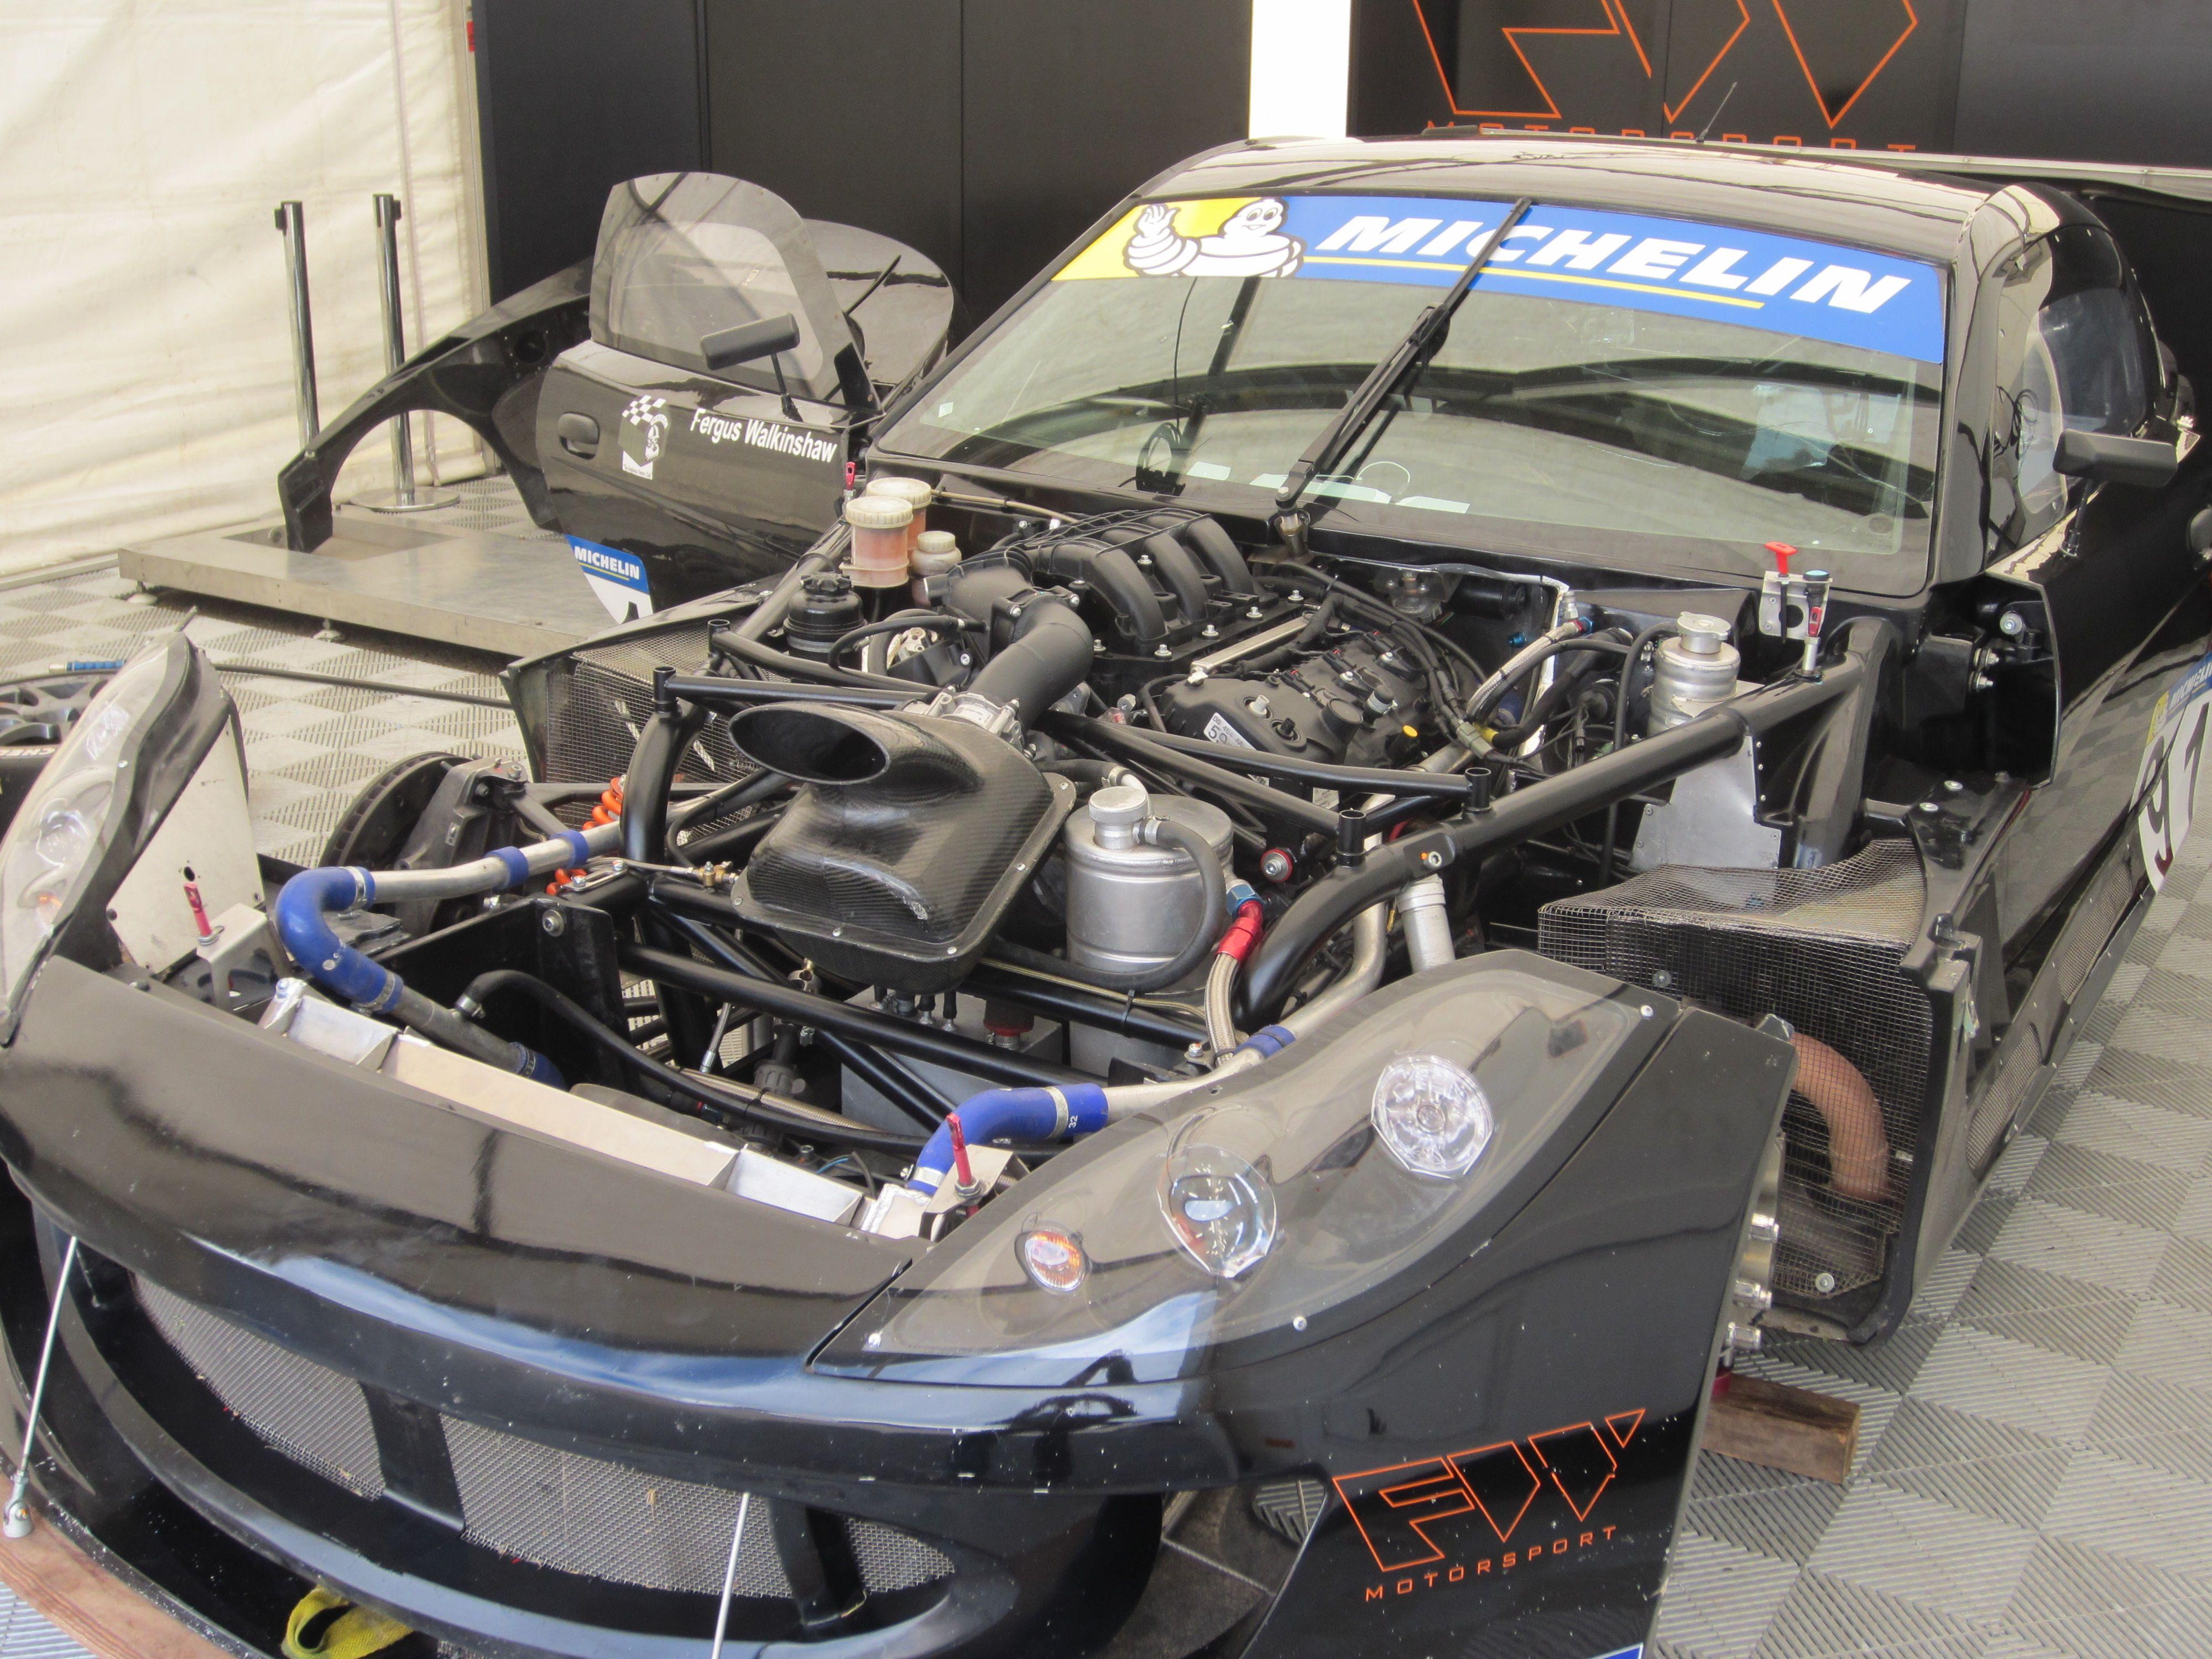 A B B E D Ce Ae F on Ford V6 Performance Crate Engines